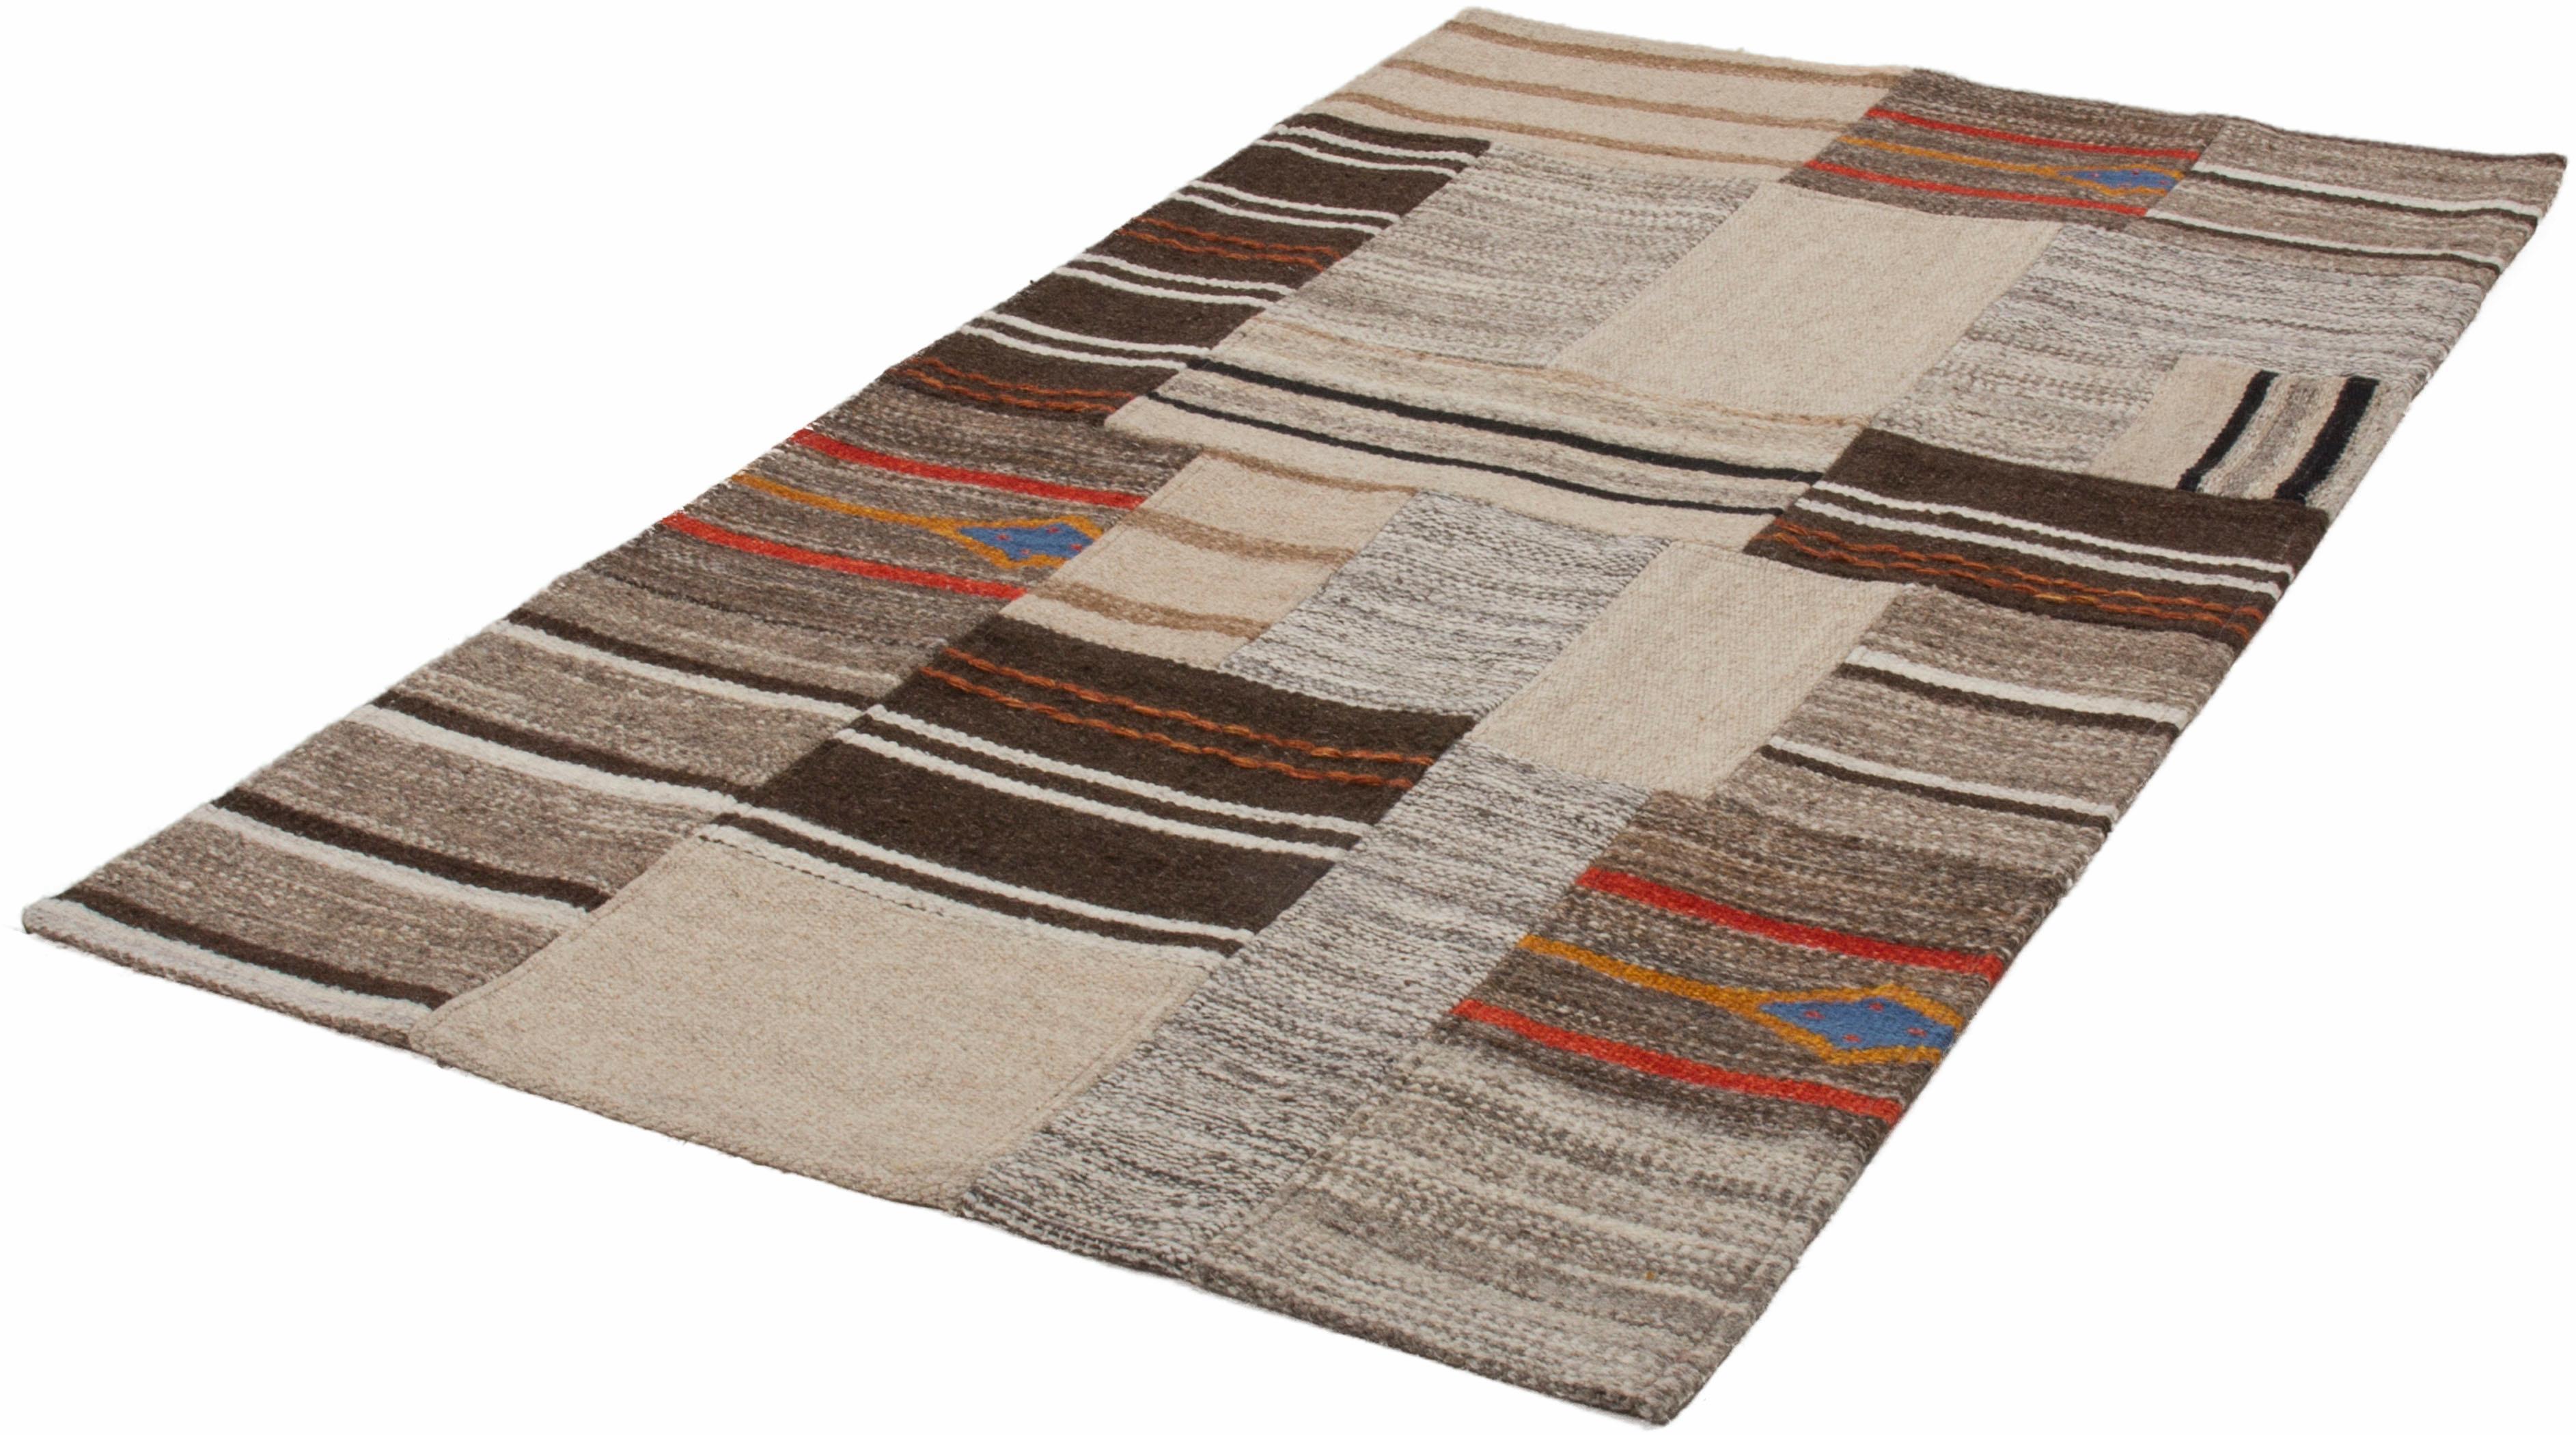 Teppich Radical 220 Kayoom rechteckig Höhe 12 mm handgewebt